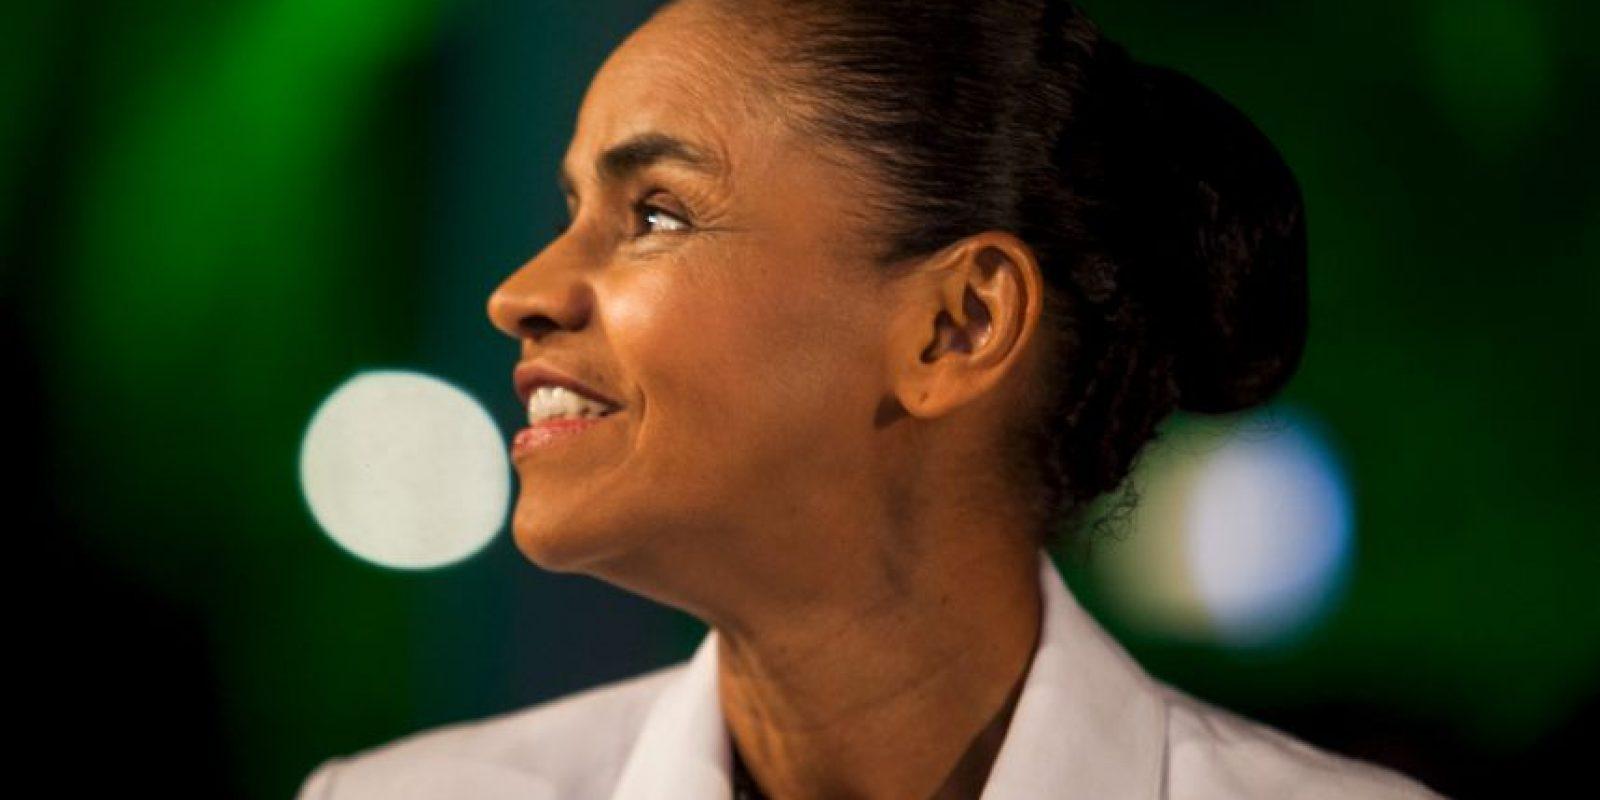 La candidata Mariana Silva Foto:Getty Images